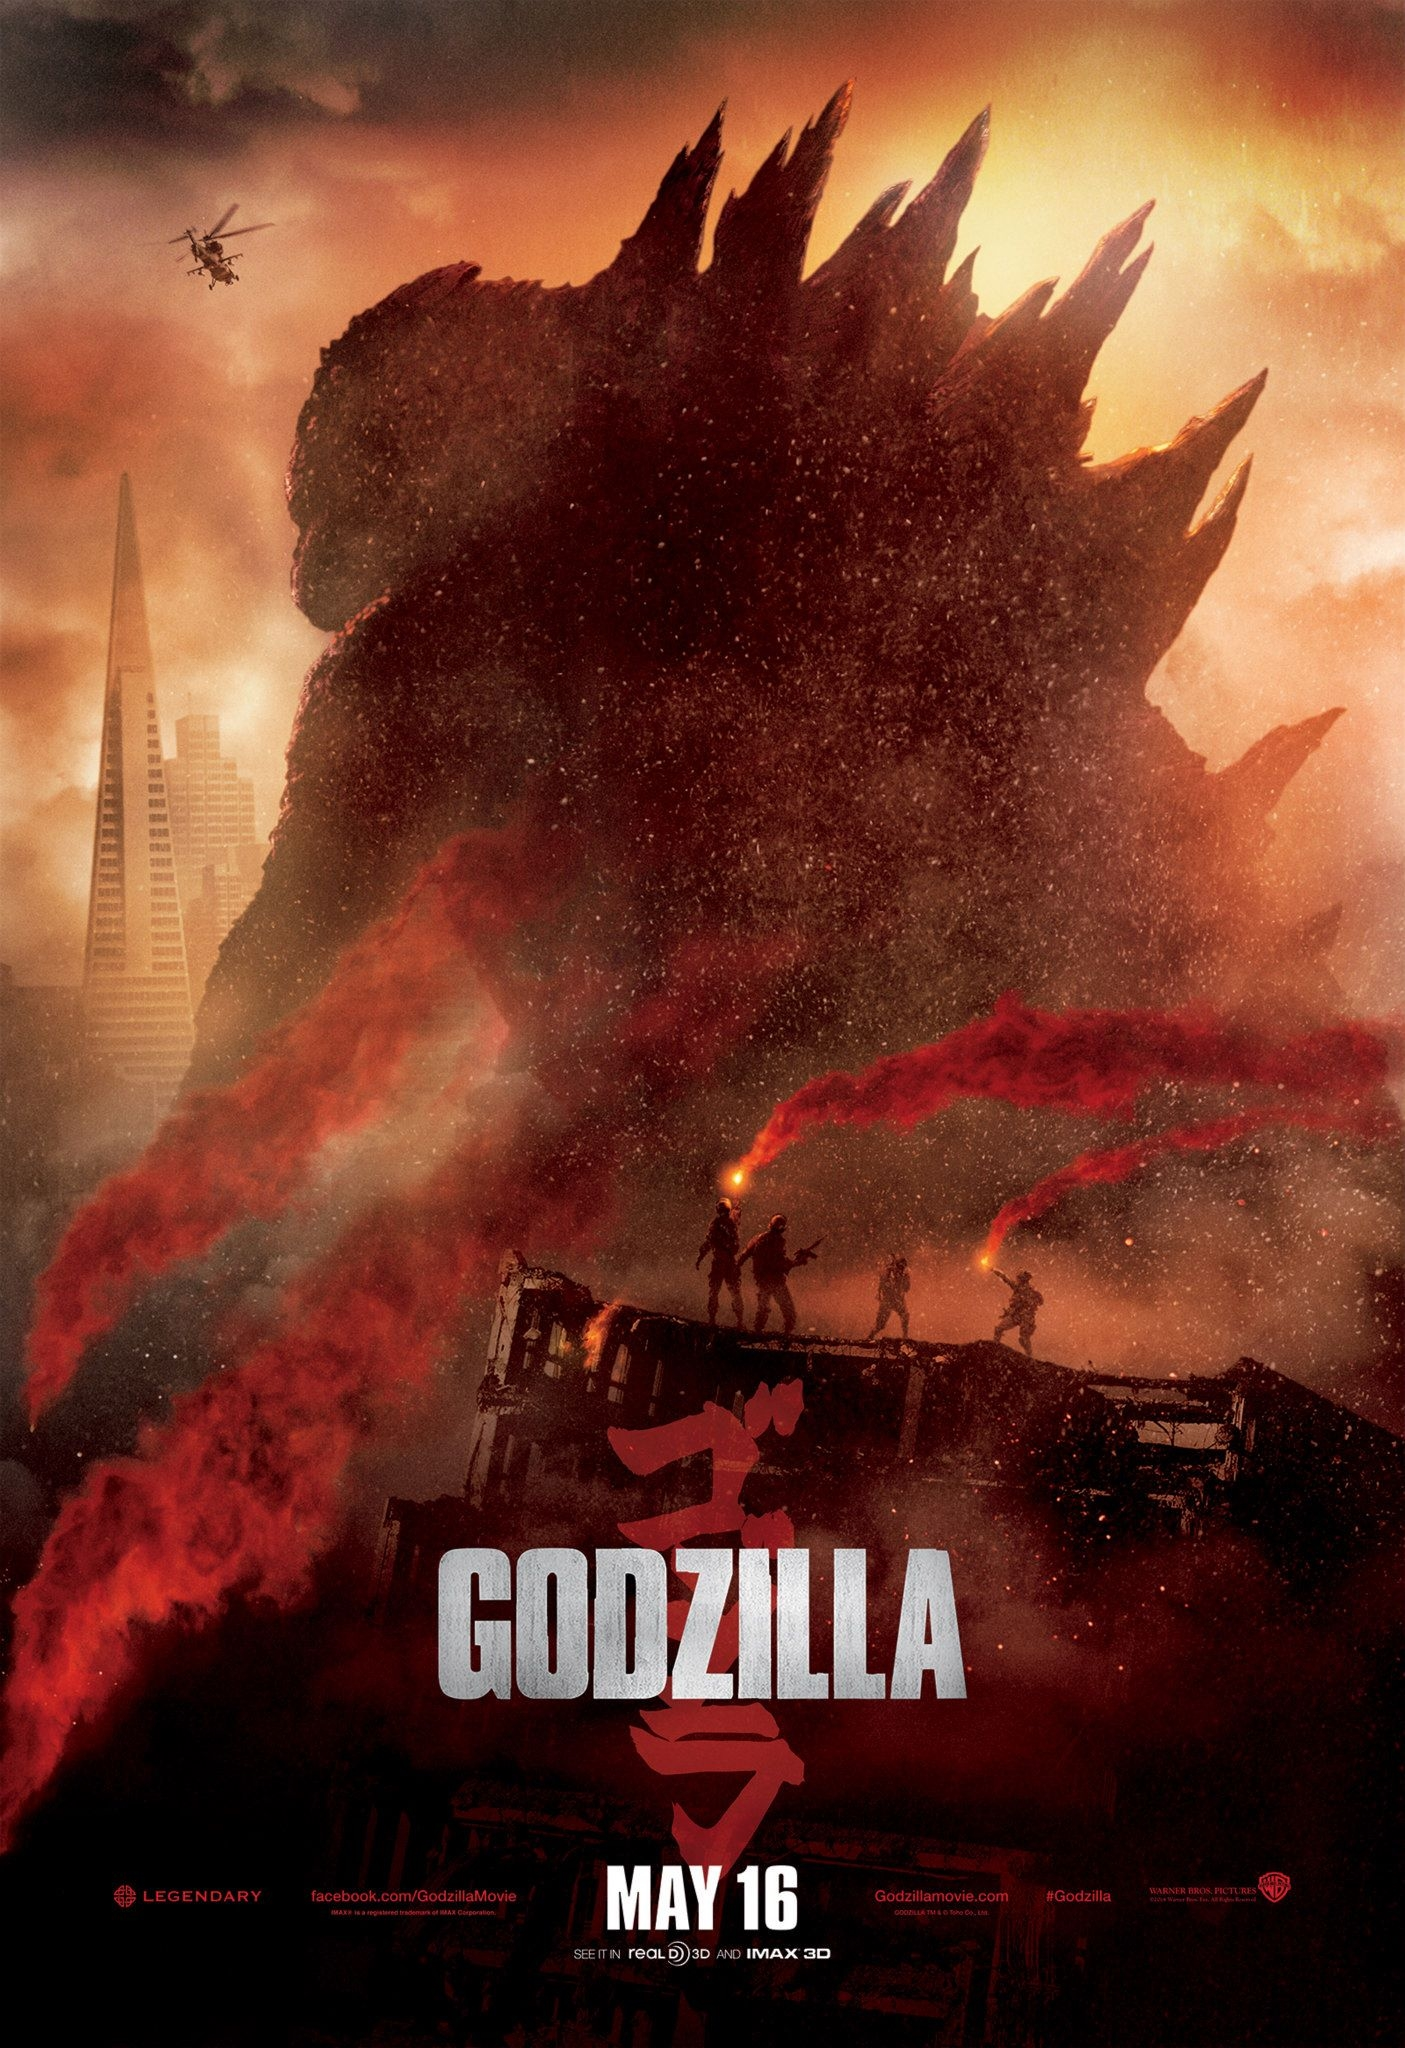 Filmkritik: Godzilla (2014)